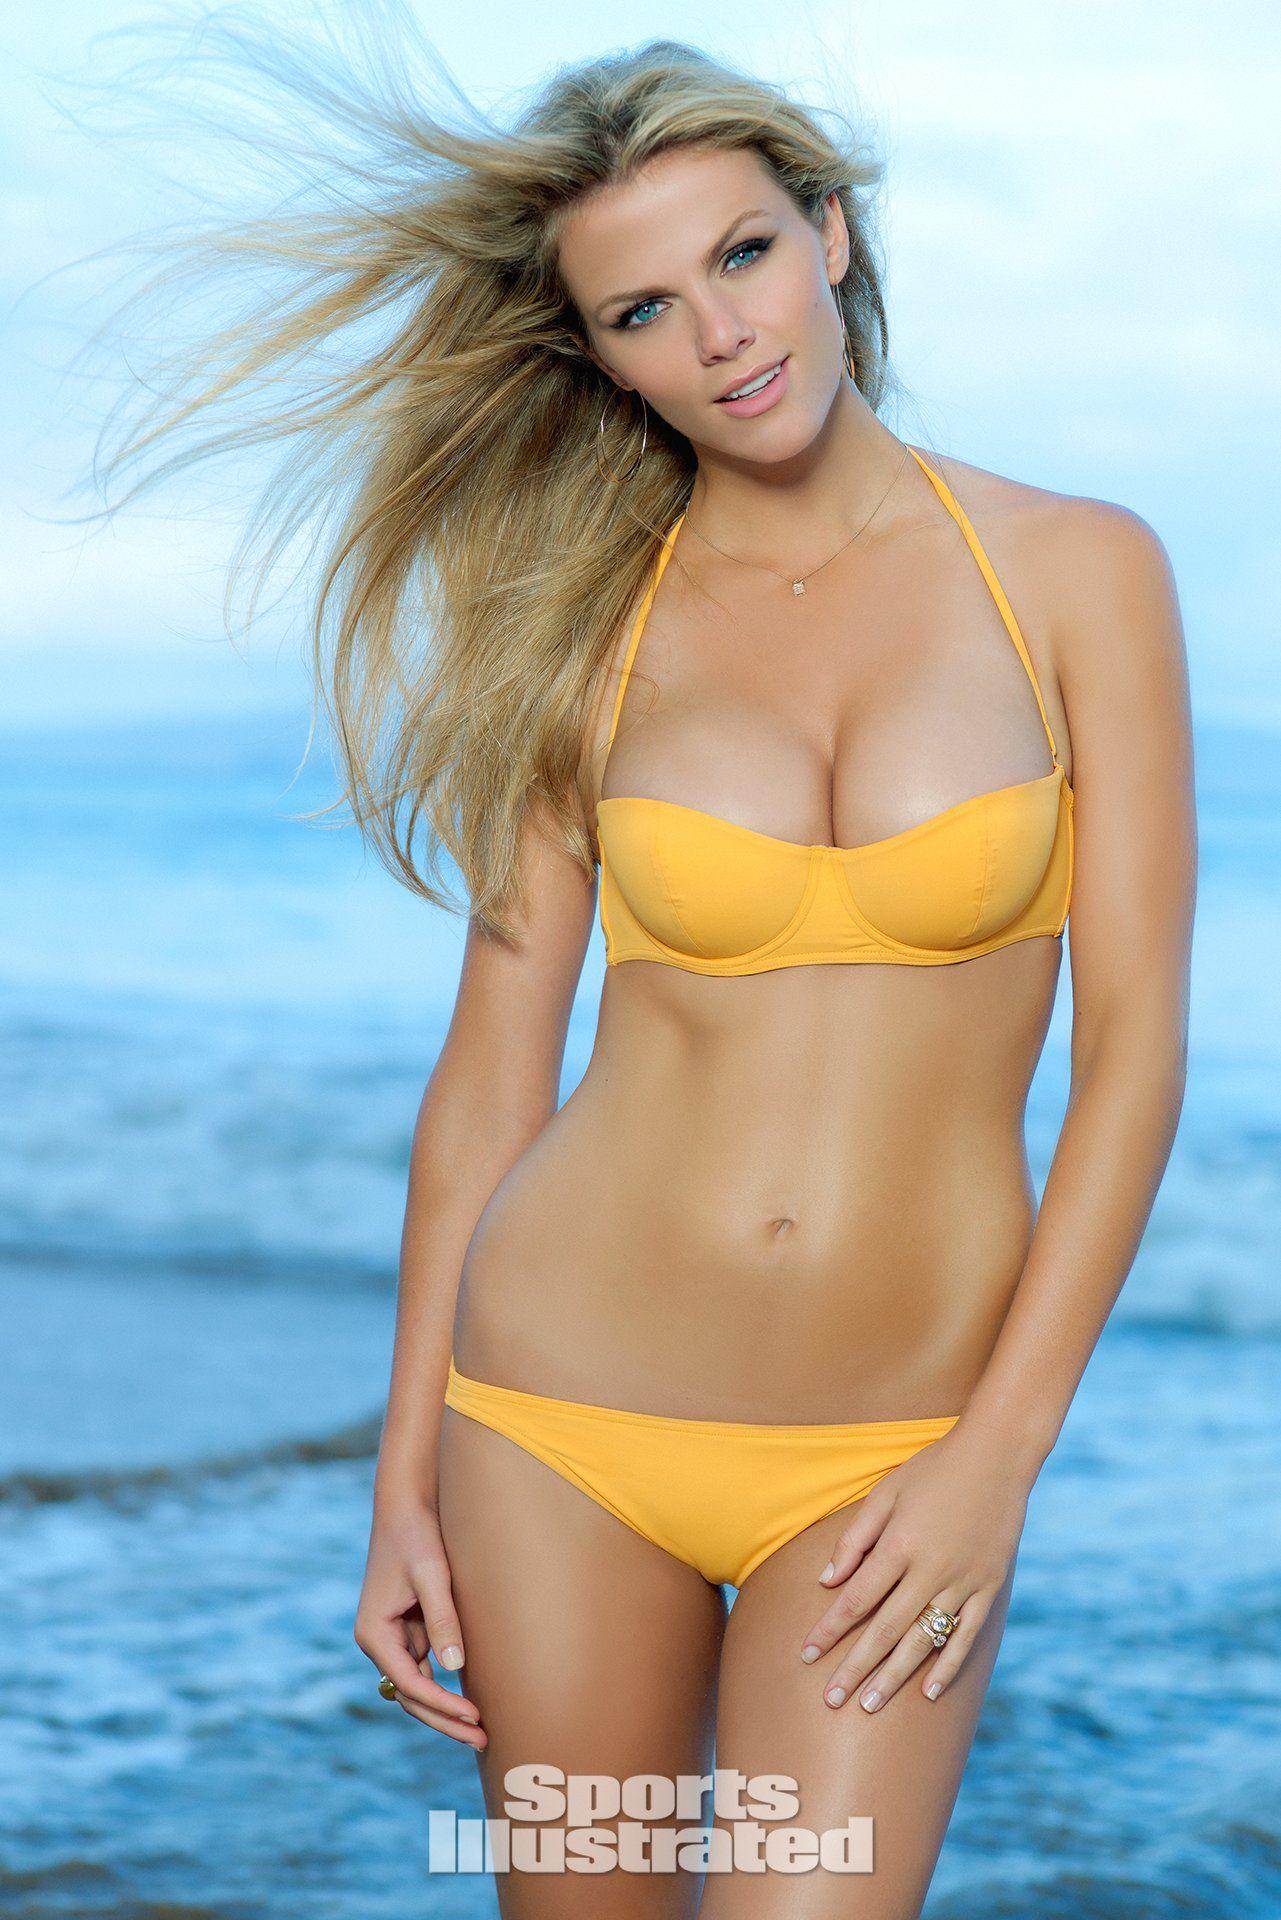 Pop Minute - Brooklyn Decker Bikini Si 2k10 Photos - Photo 13